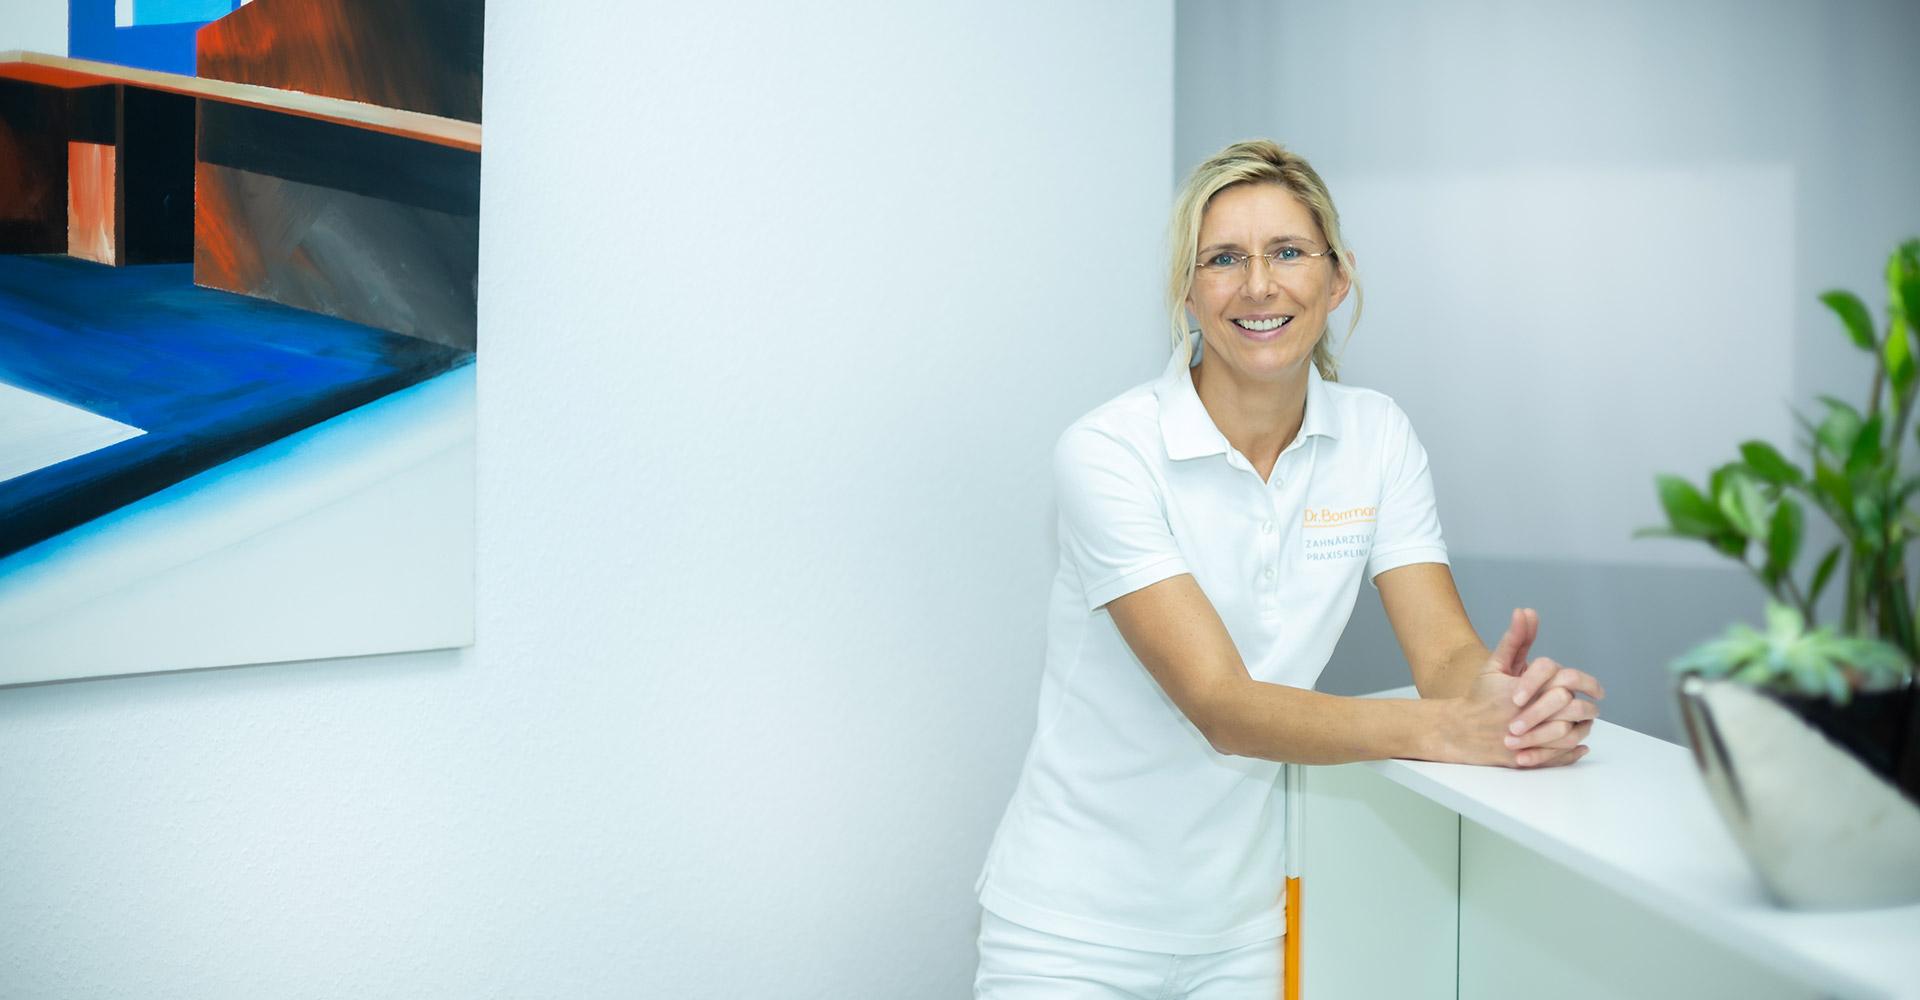 Zahnärztliche Praxisklinik Dr. Borrmann